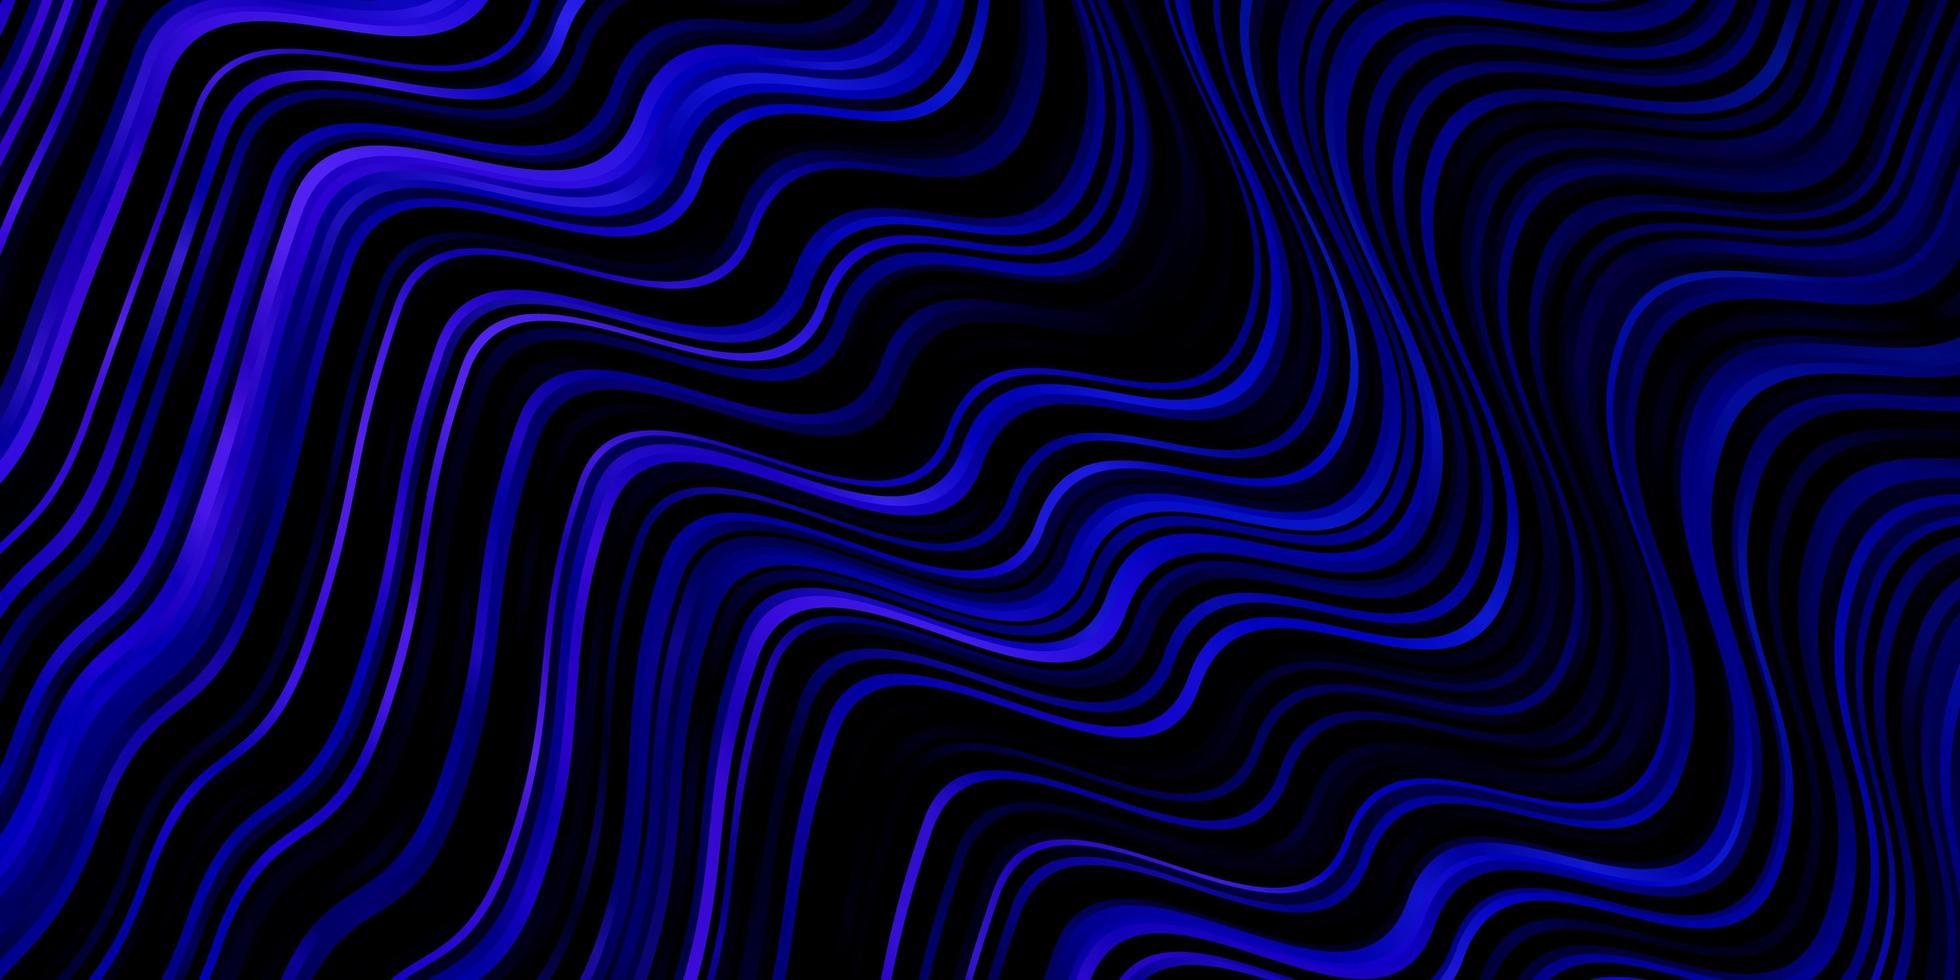 mörkrosa, blå vektorbakgrund med kurvor. vektor